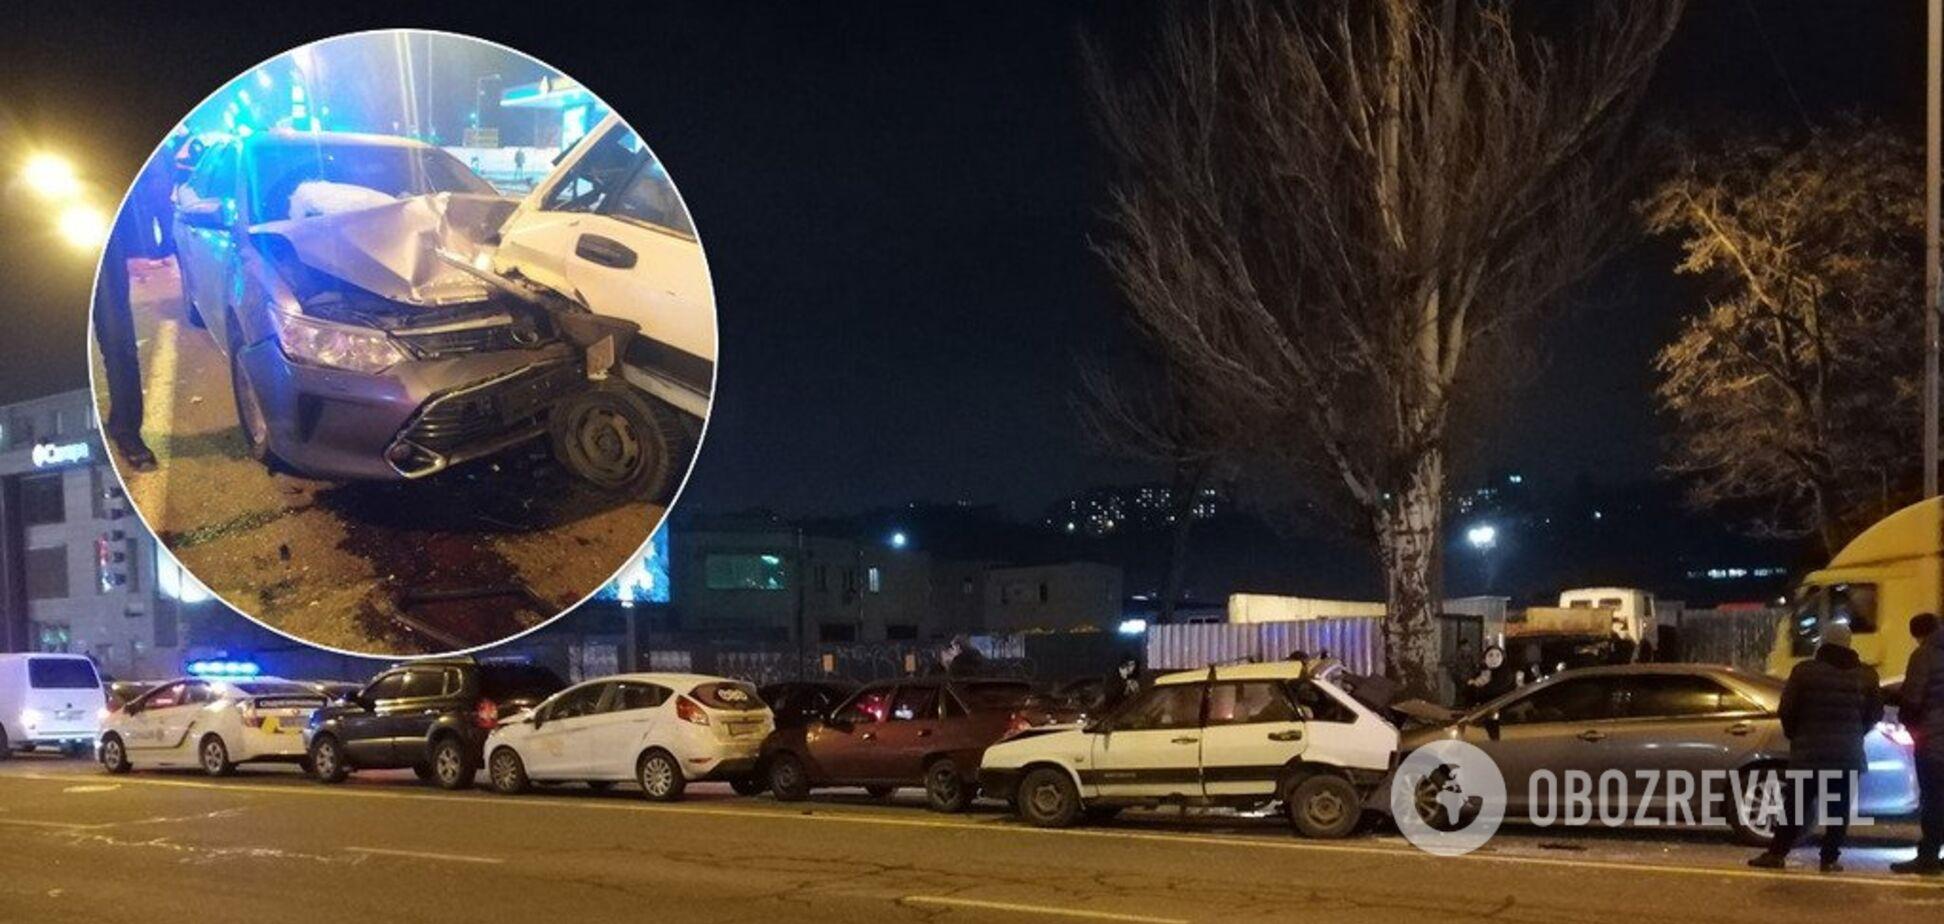 В Киеве Toyota на скорости влетела в пробку: фото и видео 'паровозика' из 6 авто